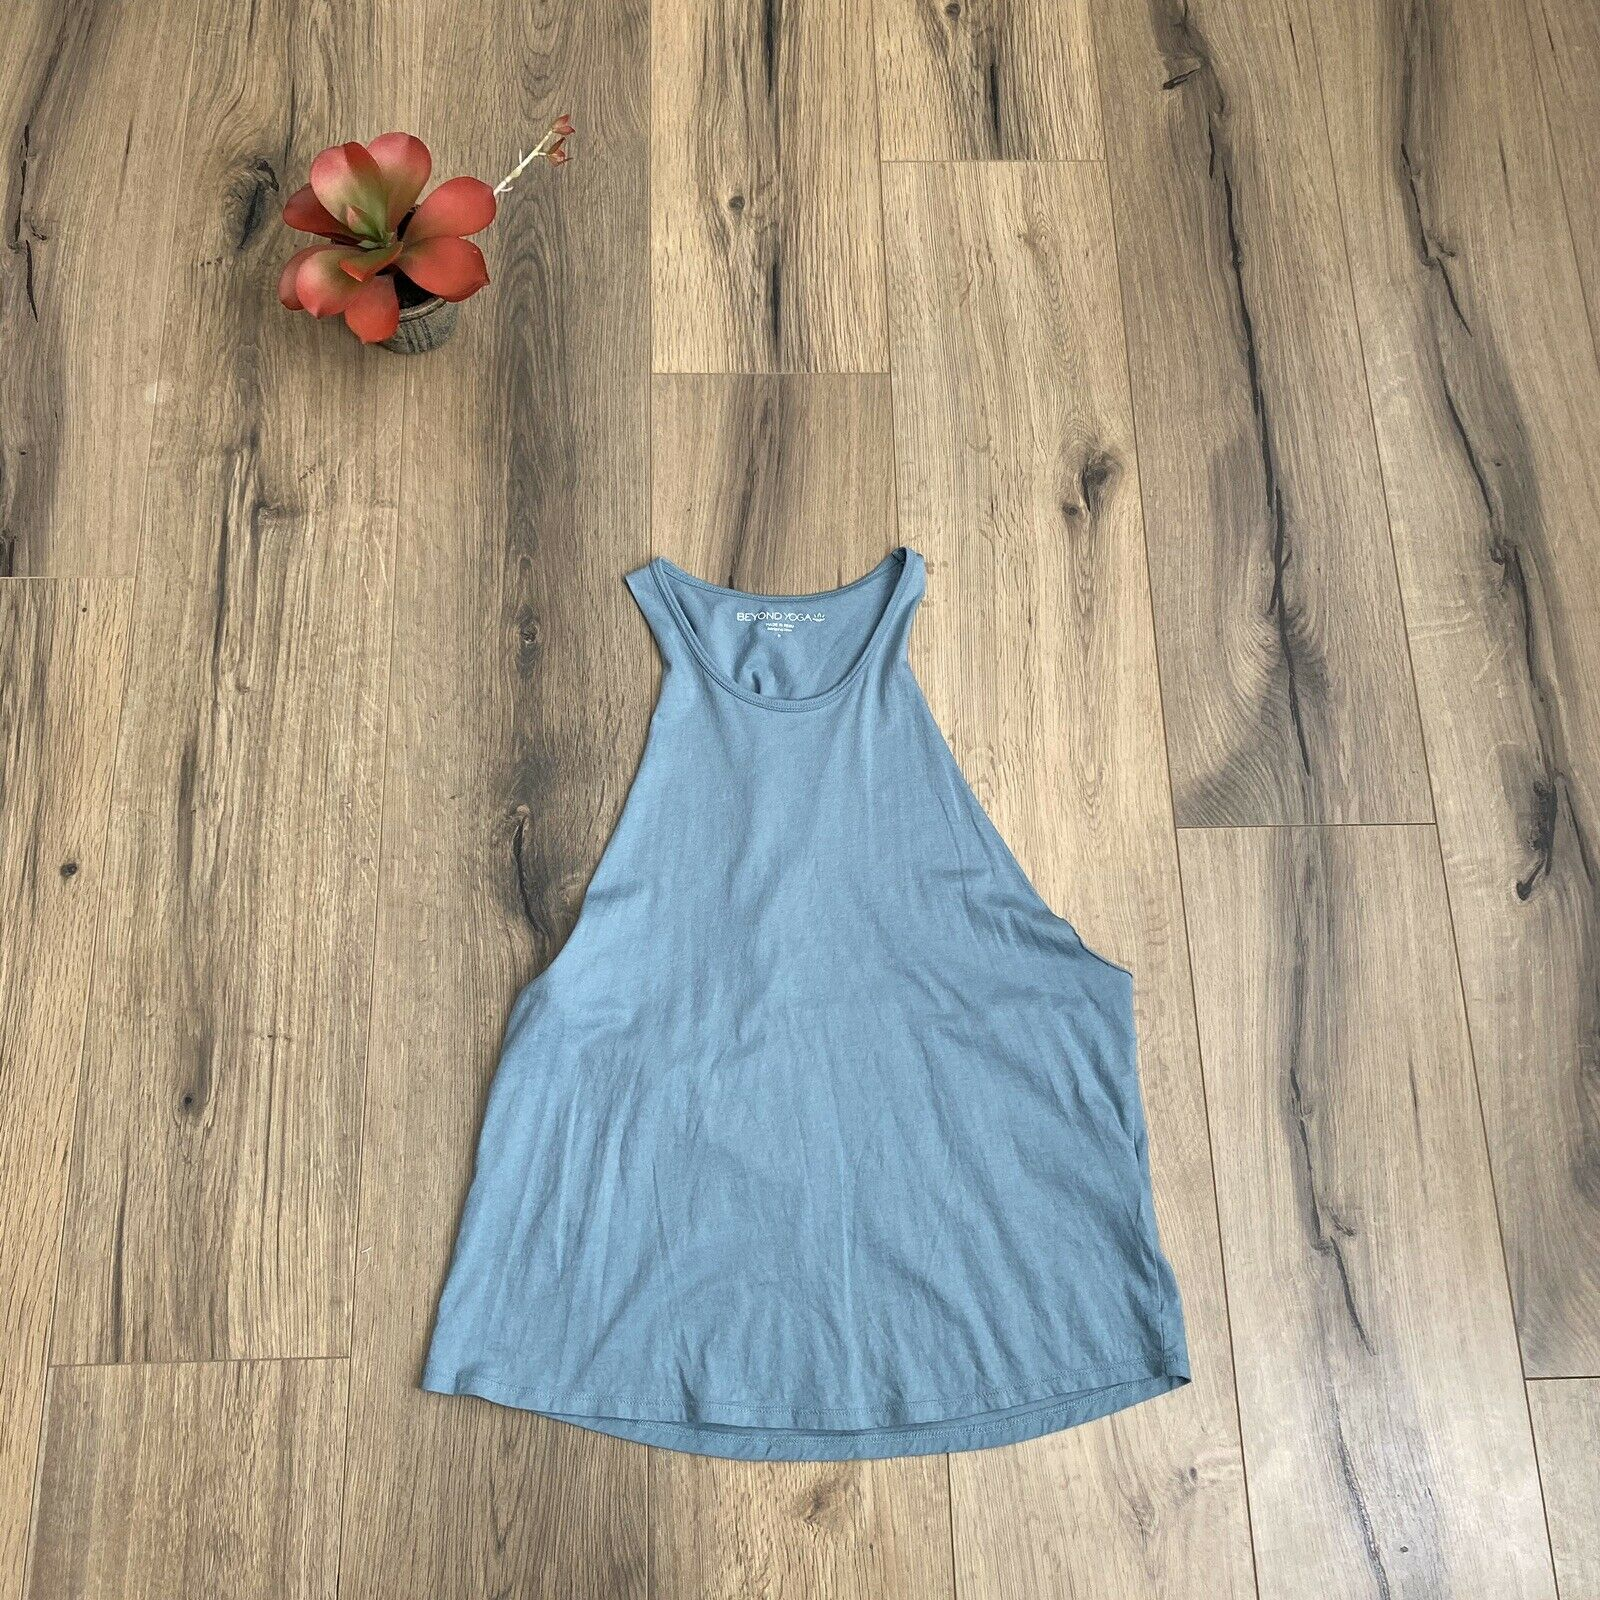 Beyond Yoga Small Blue Crush Cotton Round The Twist Tank Top Apparel EUC $58